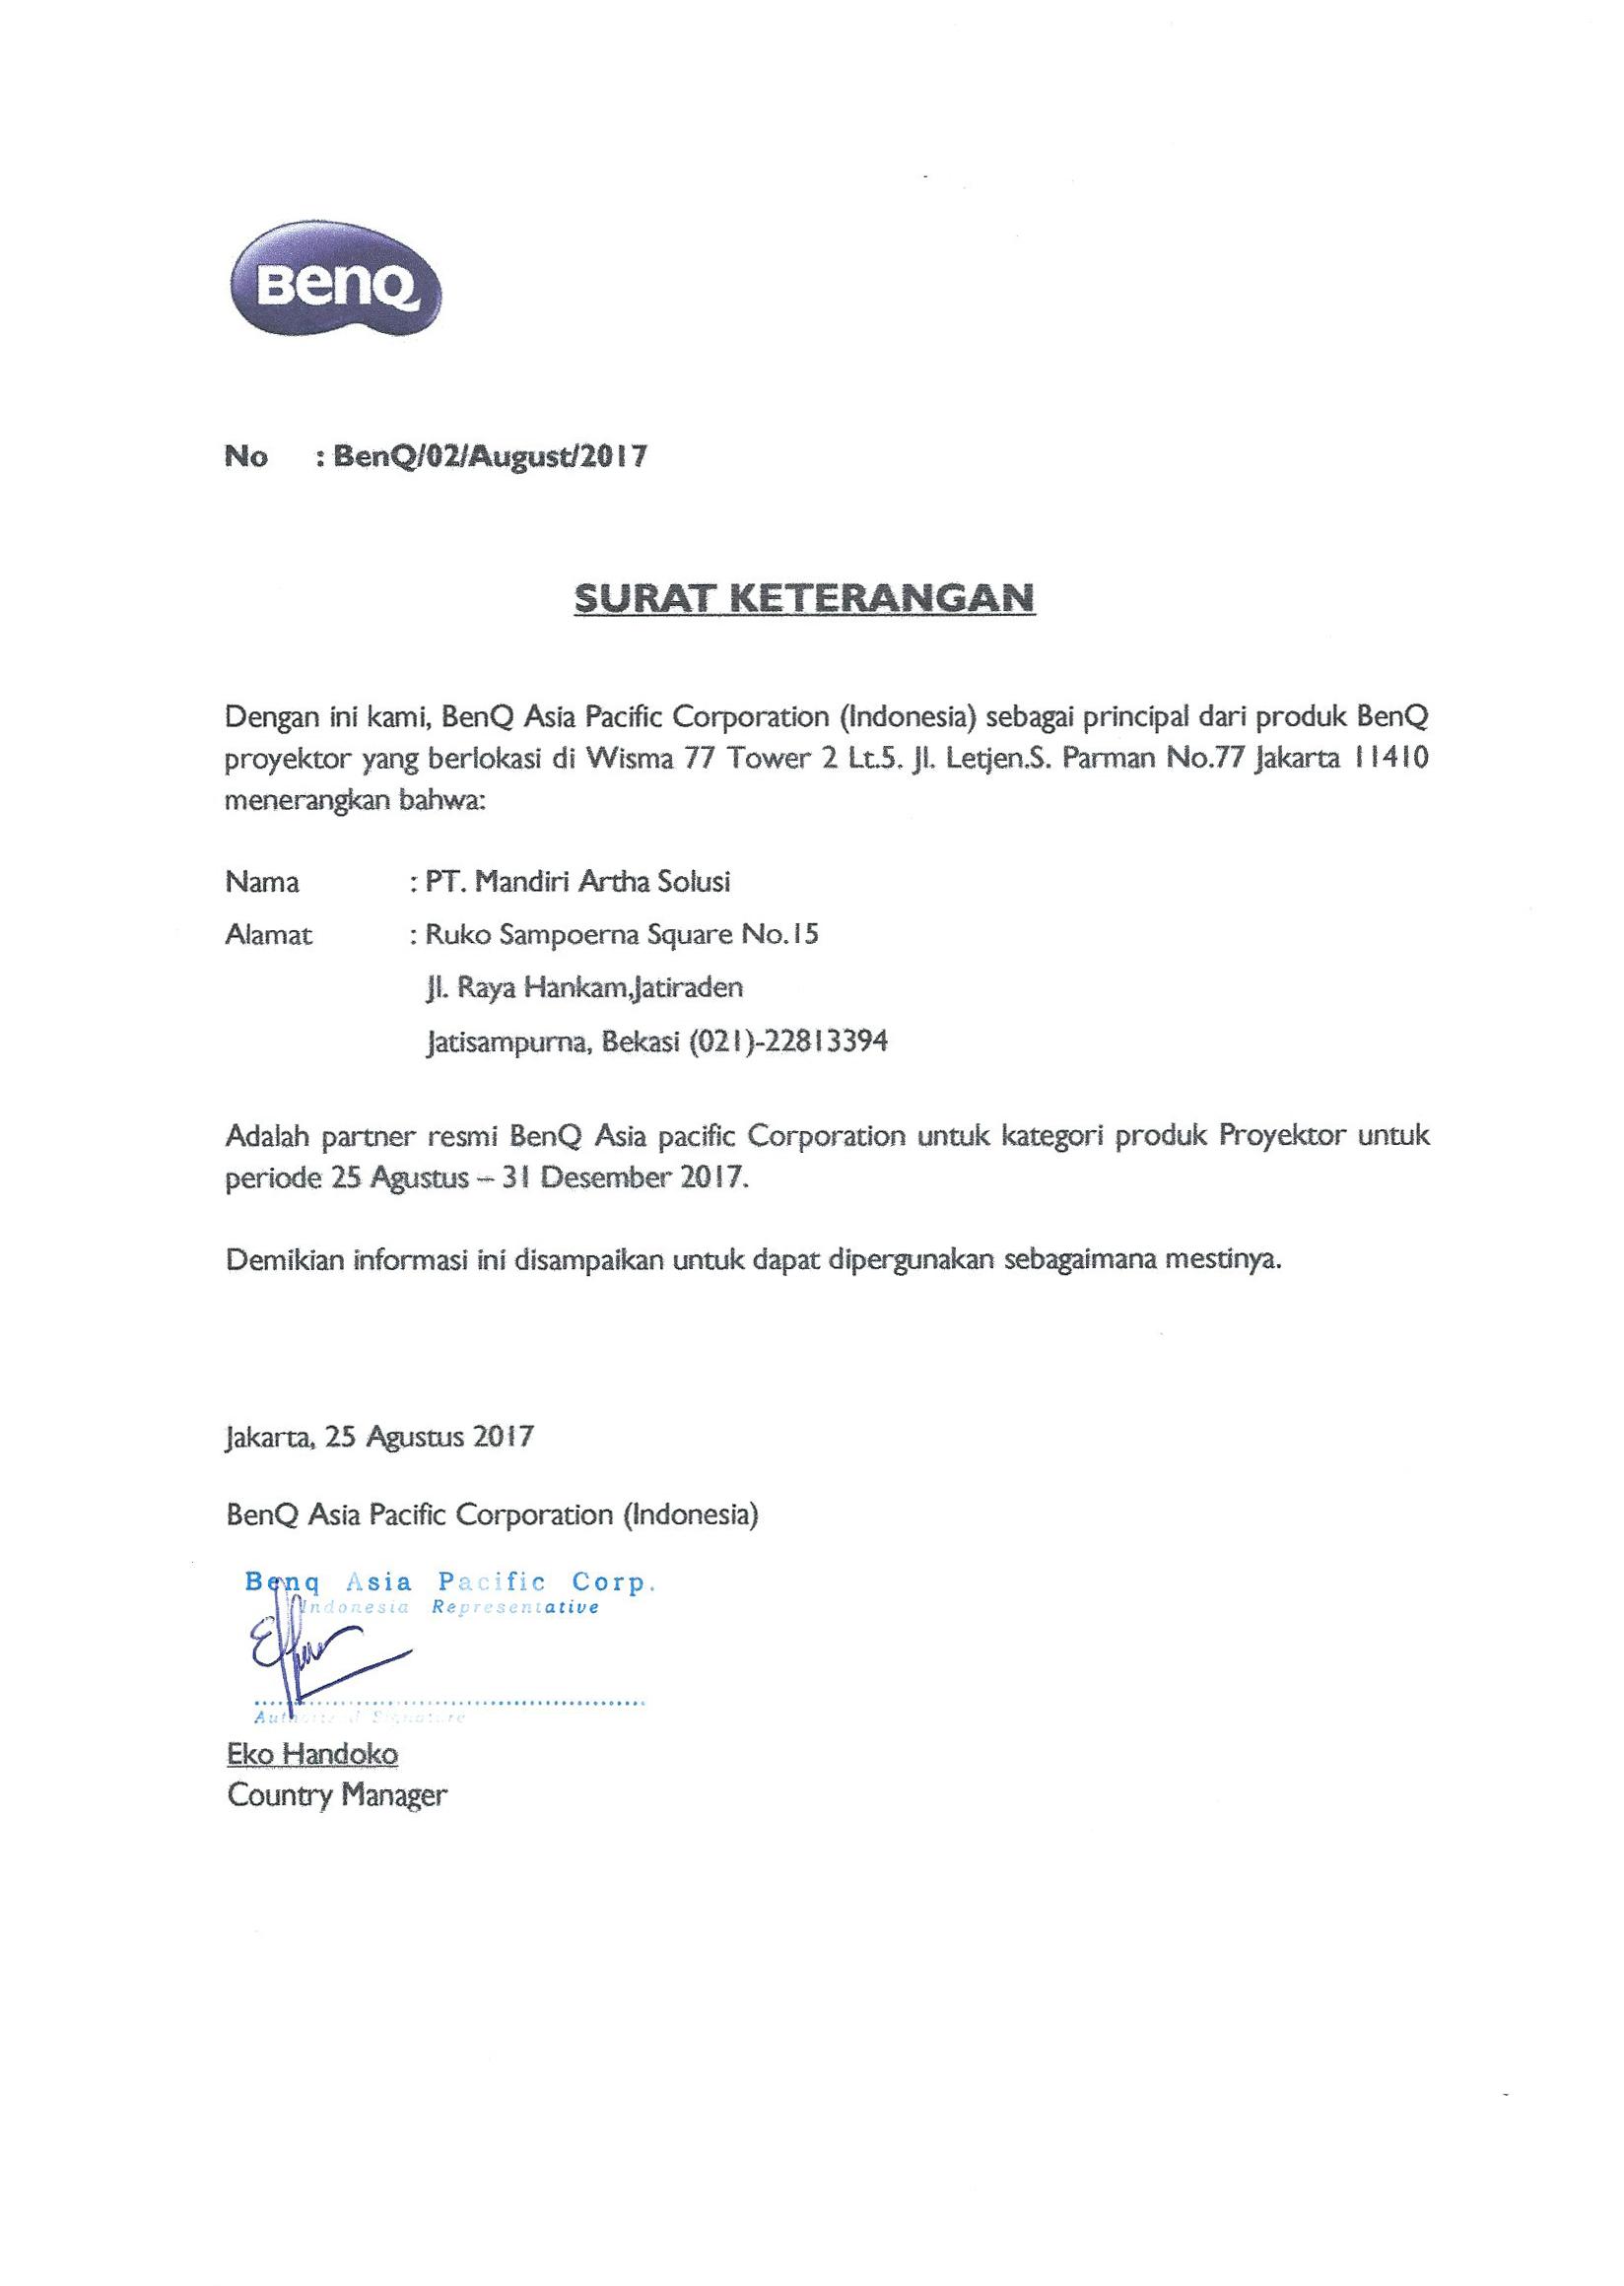 Surat Keterangan Partner BenQ